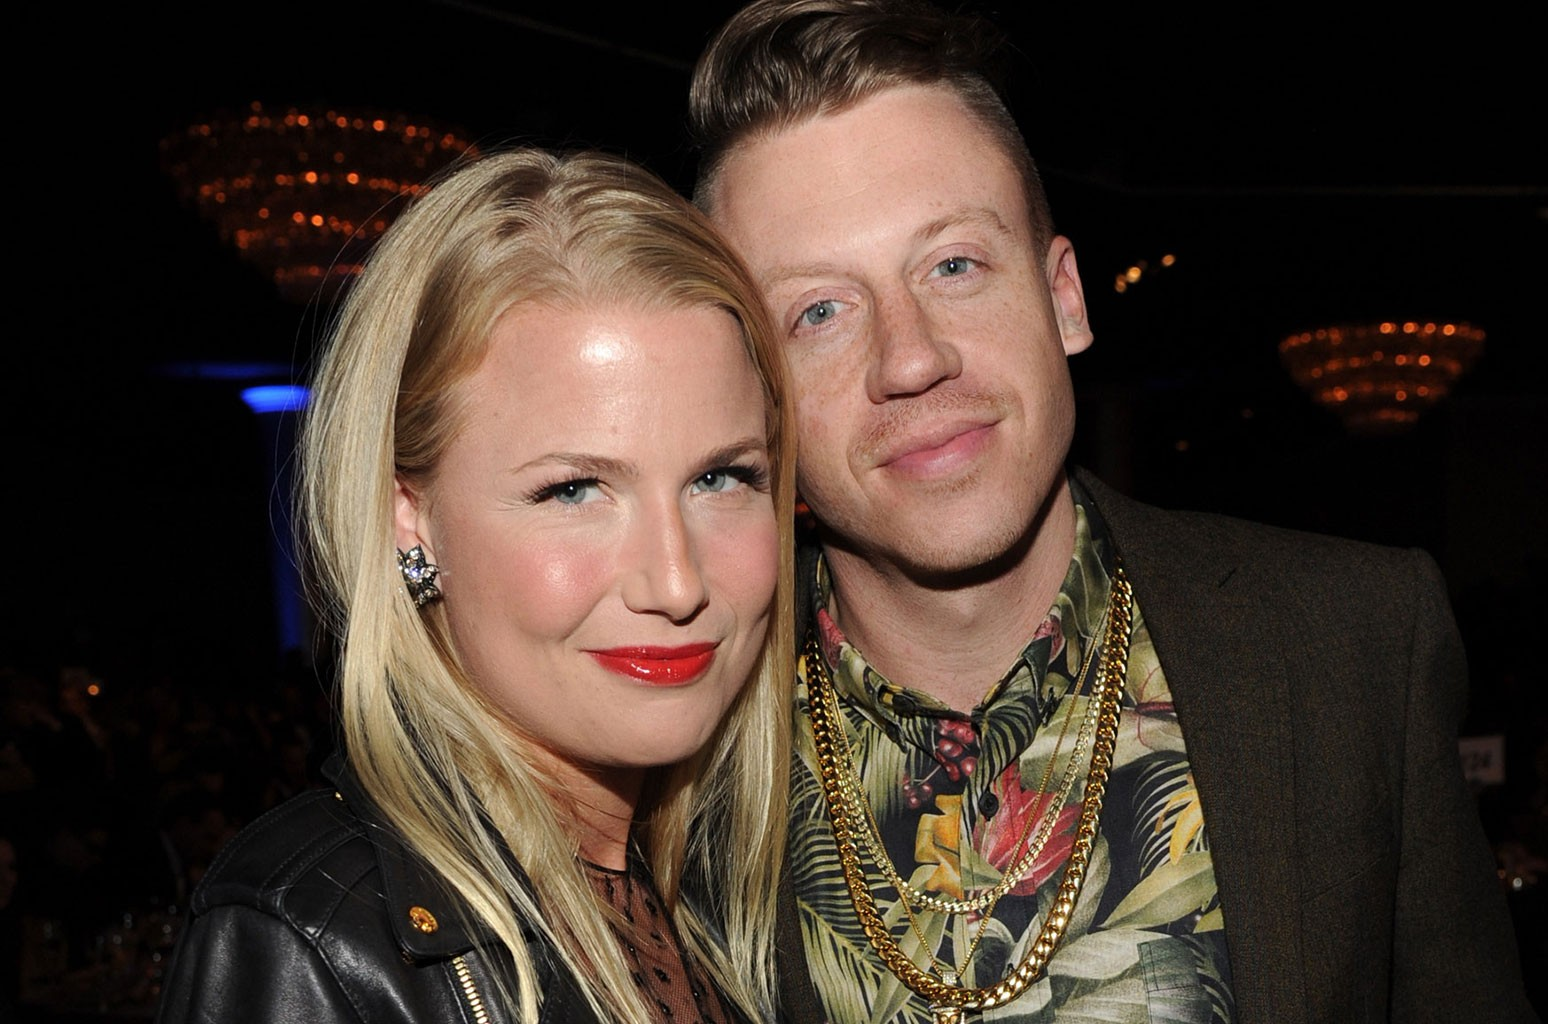 Macklemore & Wife Tricia Davis Are Expecting Baby No. 3